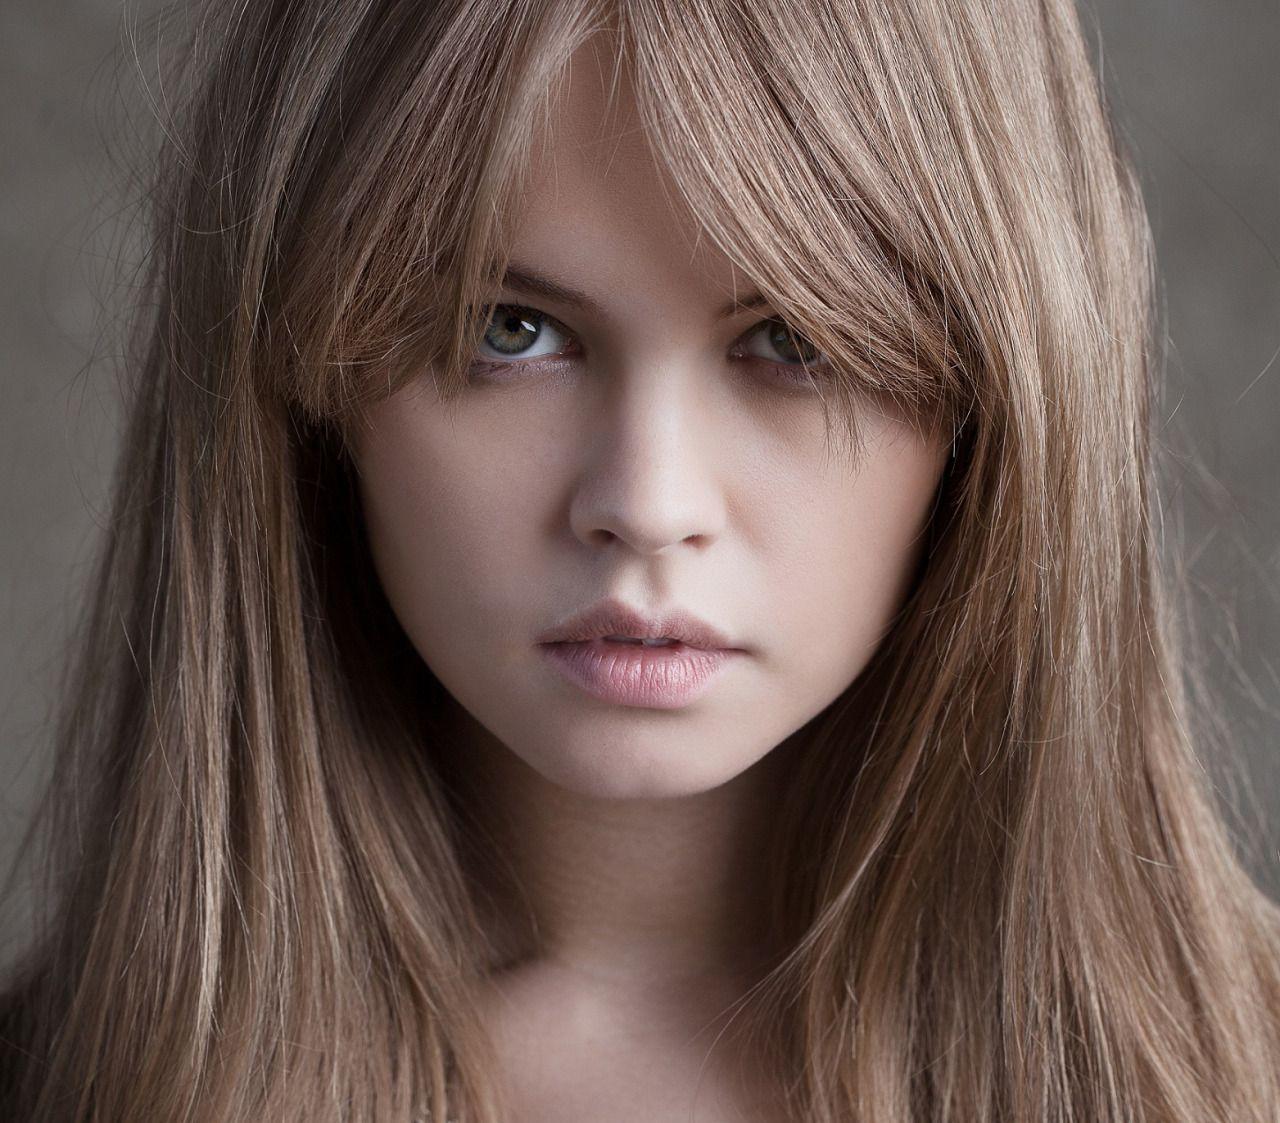 90s nose piercing  Nastya Scheglova  Ojos De Mujeres Hermosos Mas Caras Diversas